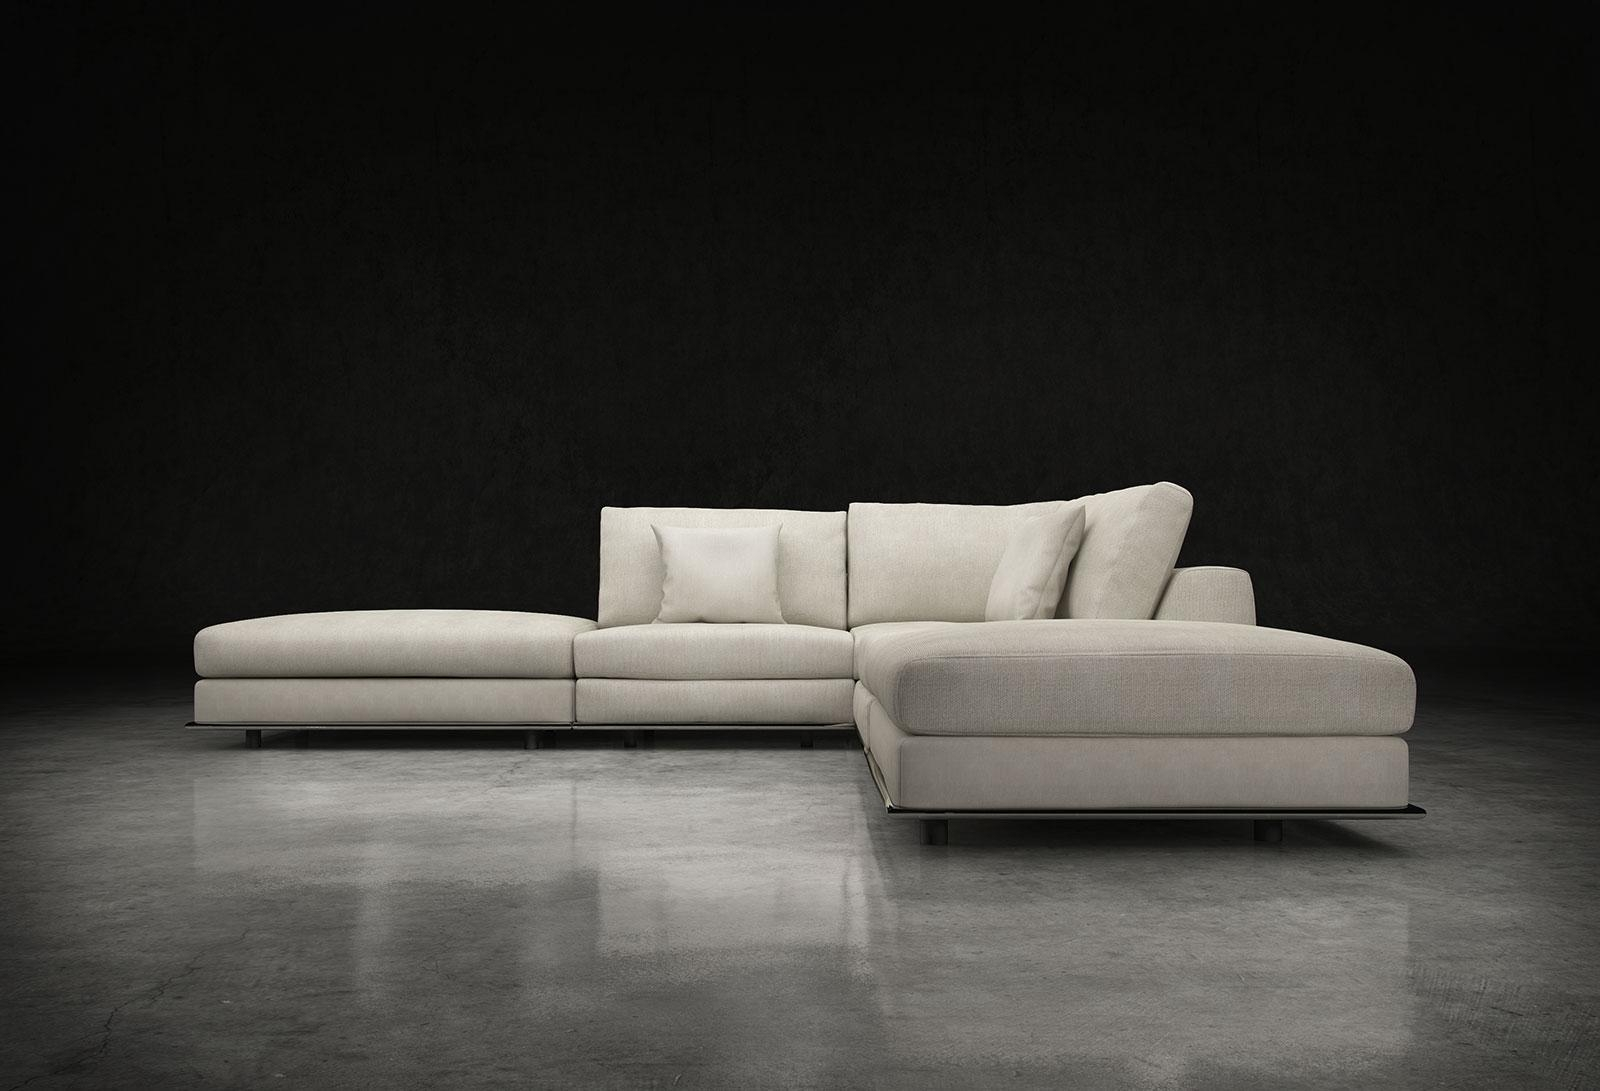 Modloft Perry Armless Corner Sofa Md820 Set04 Official Store Throughout Armless Sectional Sofas (Image 9 of 15)